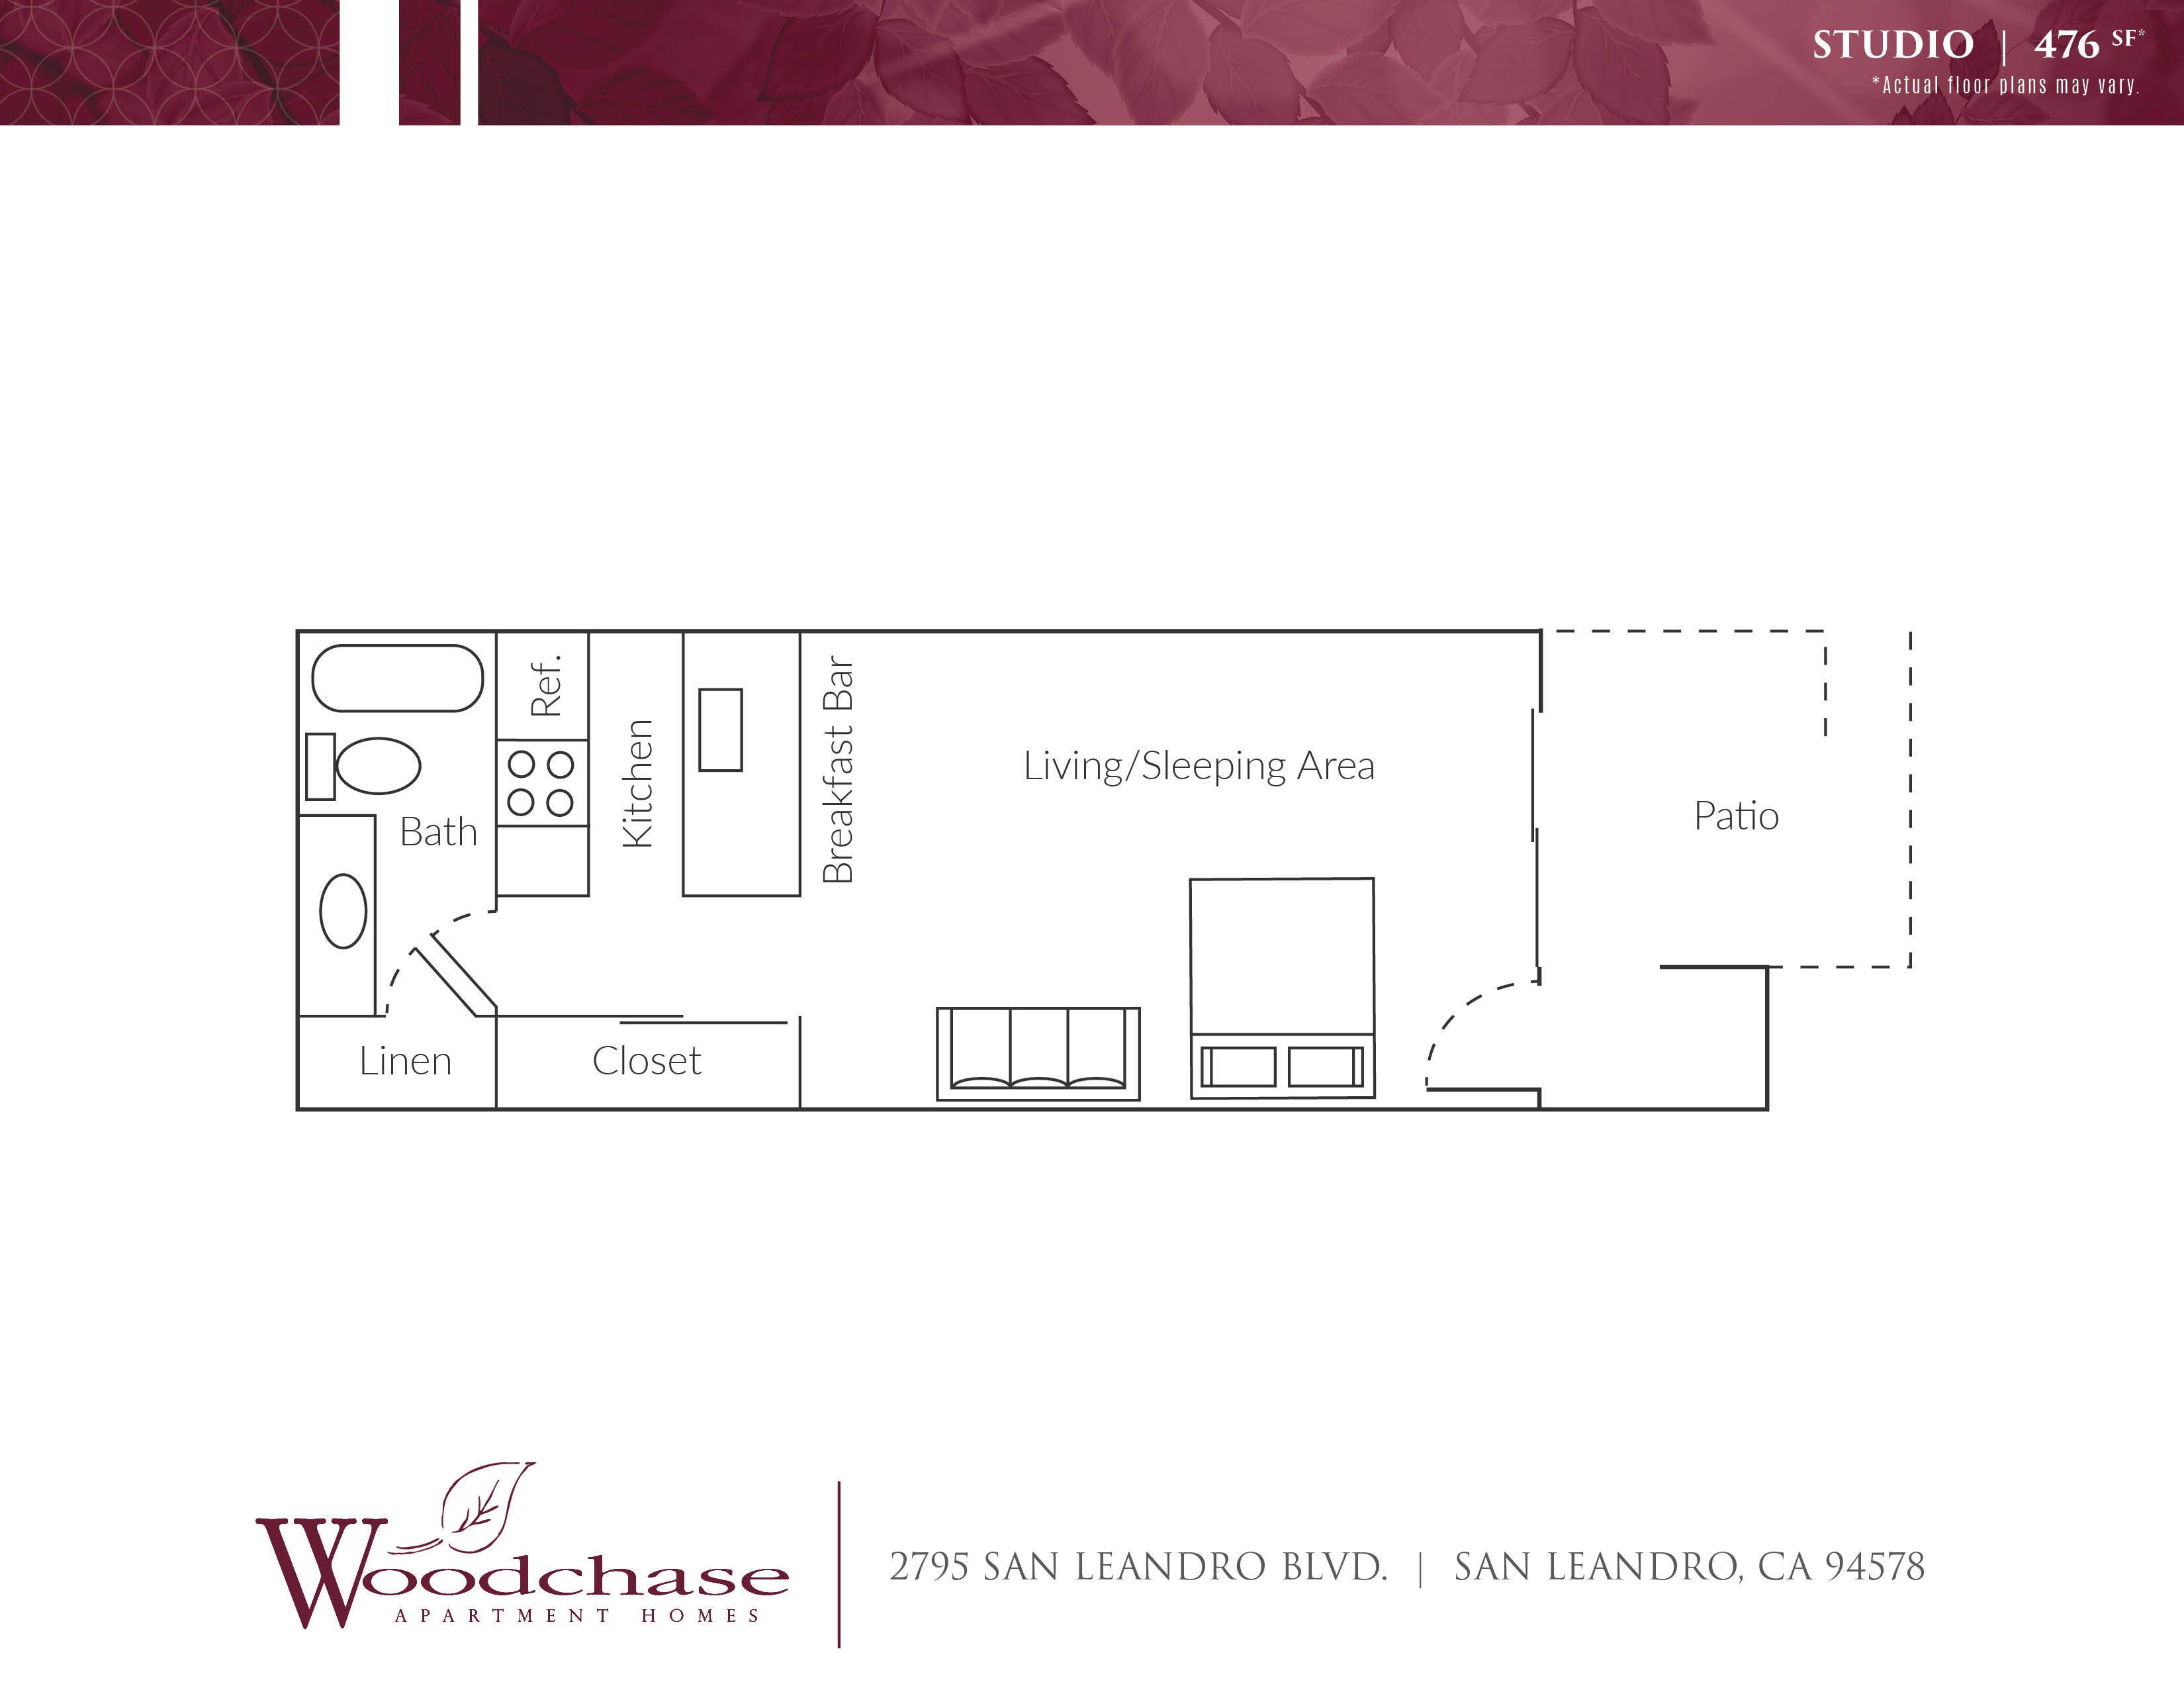 Woodchase Apartment Homes photo